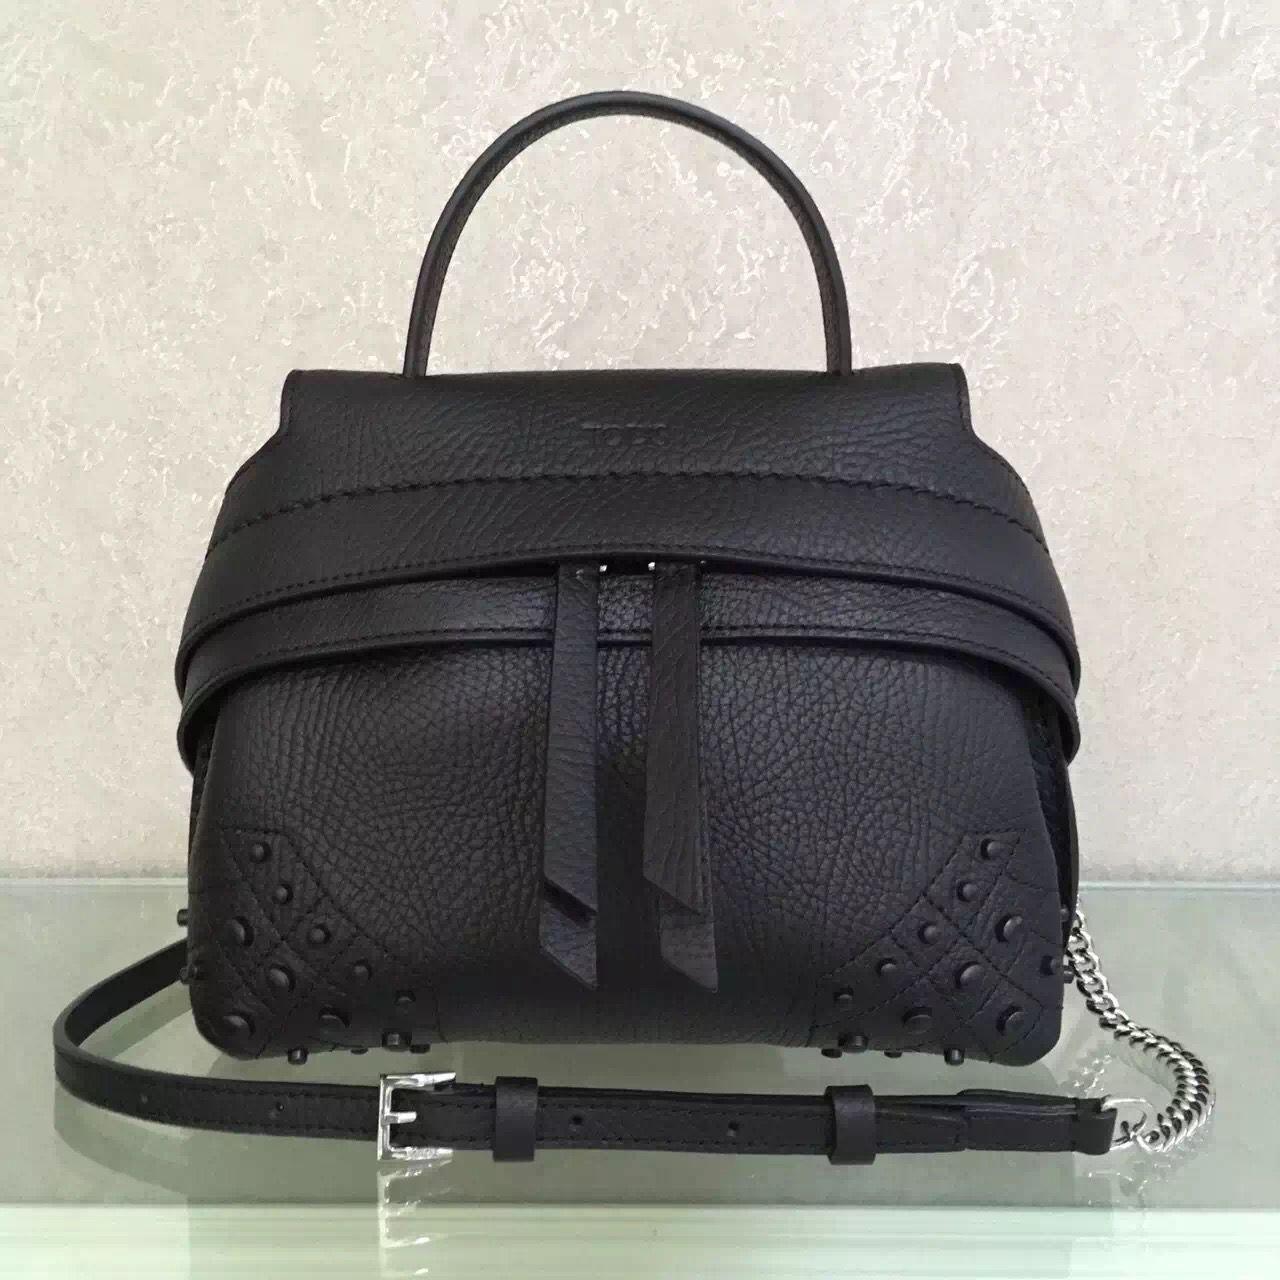 497a9e7bd13 Tod's Wave Bag 100% Authentic 80% Off | Tod's Bags Sale | Designer ...